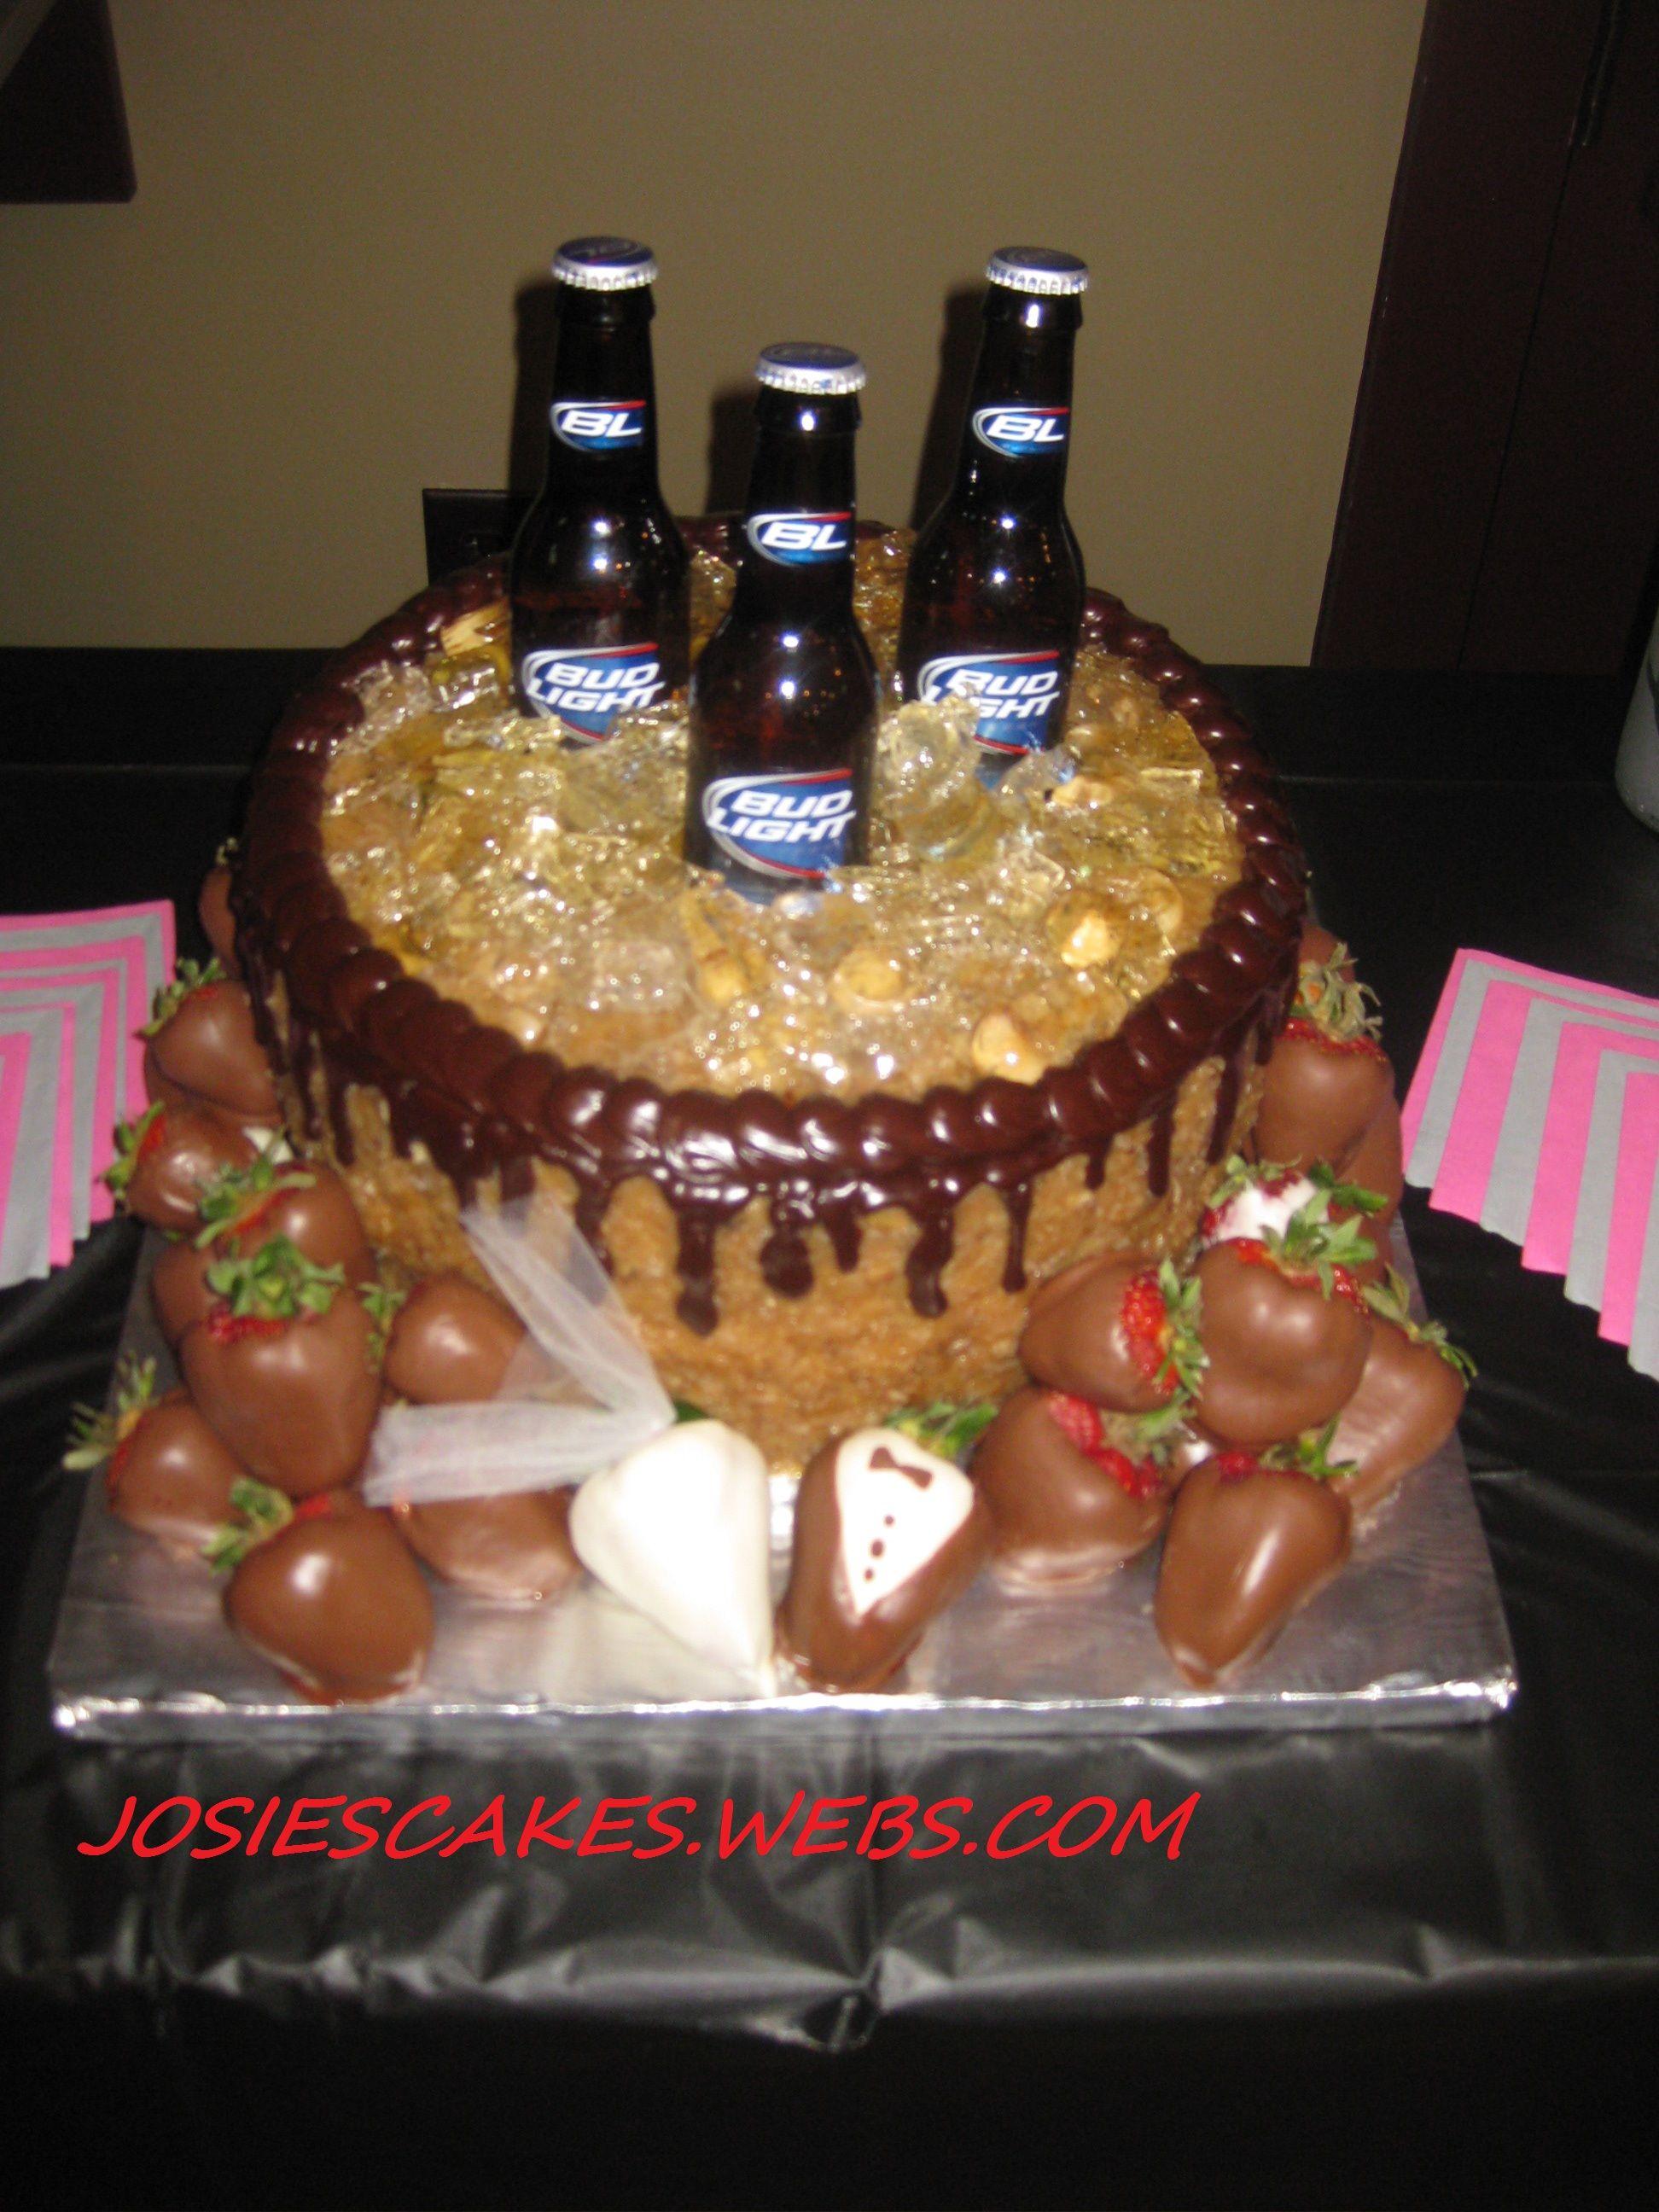 Decorated German Chocolate Cake German Chocolate Grooms Cake With Strawberries Wedding Cakes